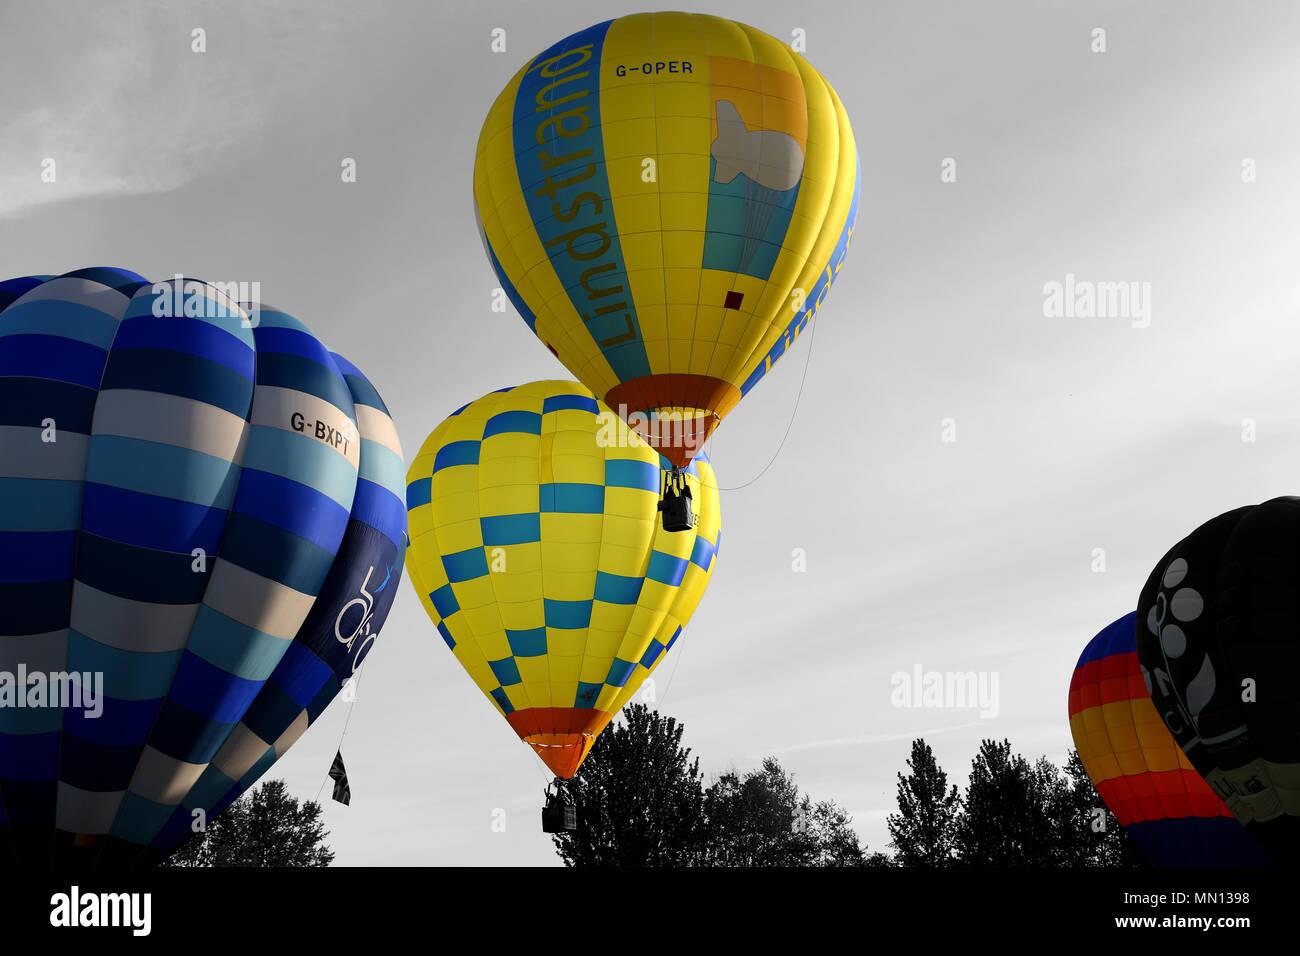 Lindstrand balloon taking off at Telford Balloon and Kite Festival, Telford Town Centre, Telford, Shropshire.  United Kingdom.  12th May 2018 Stock Photo